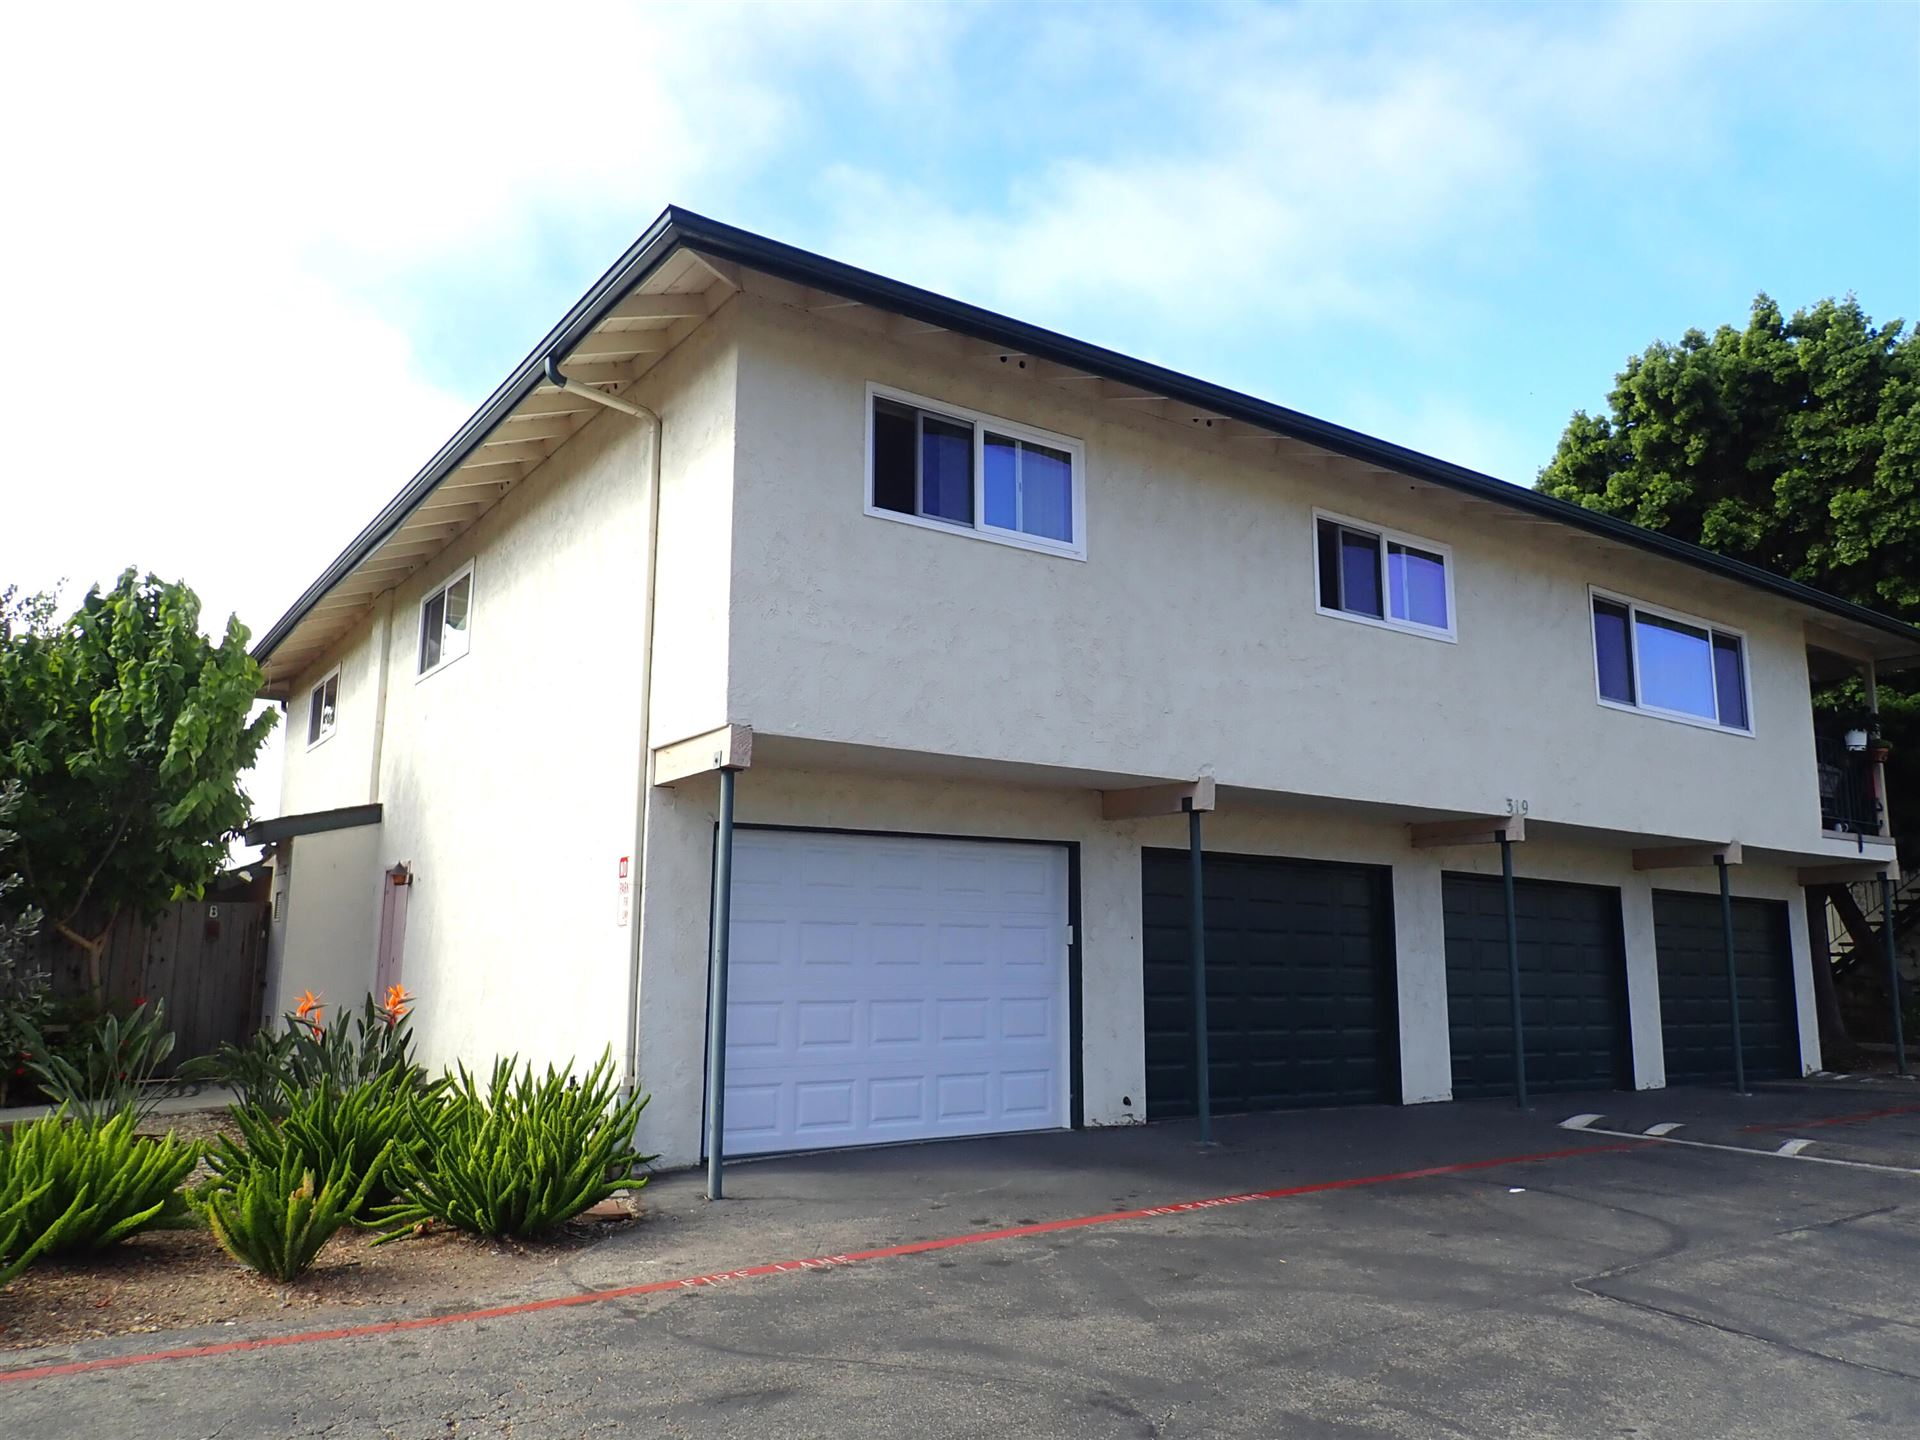 319 Northgate Dr #B, Goleta, CA 93117 - MLS#: 21-3458